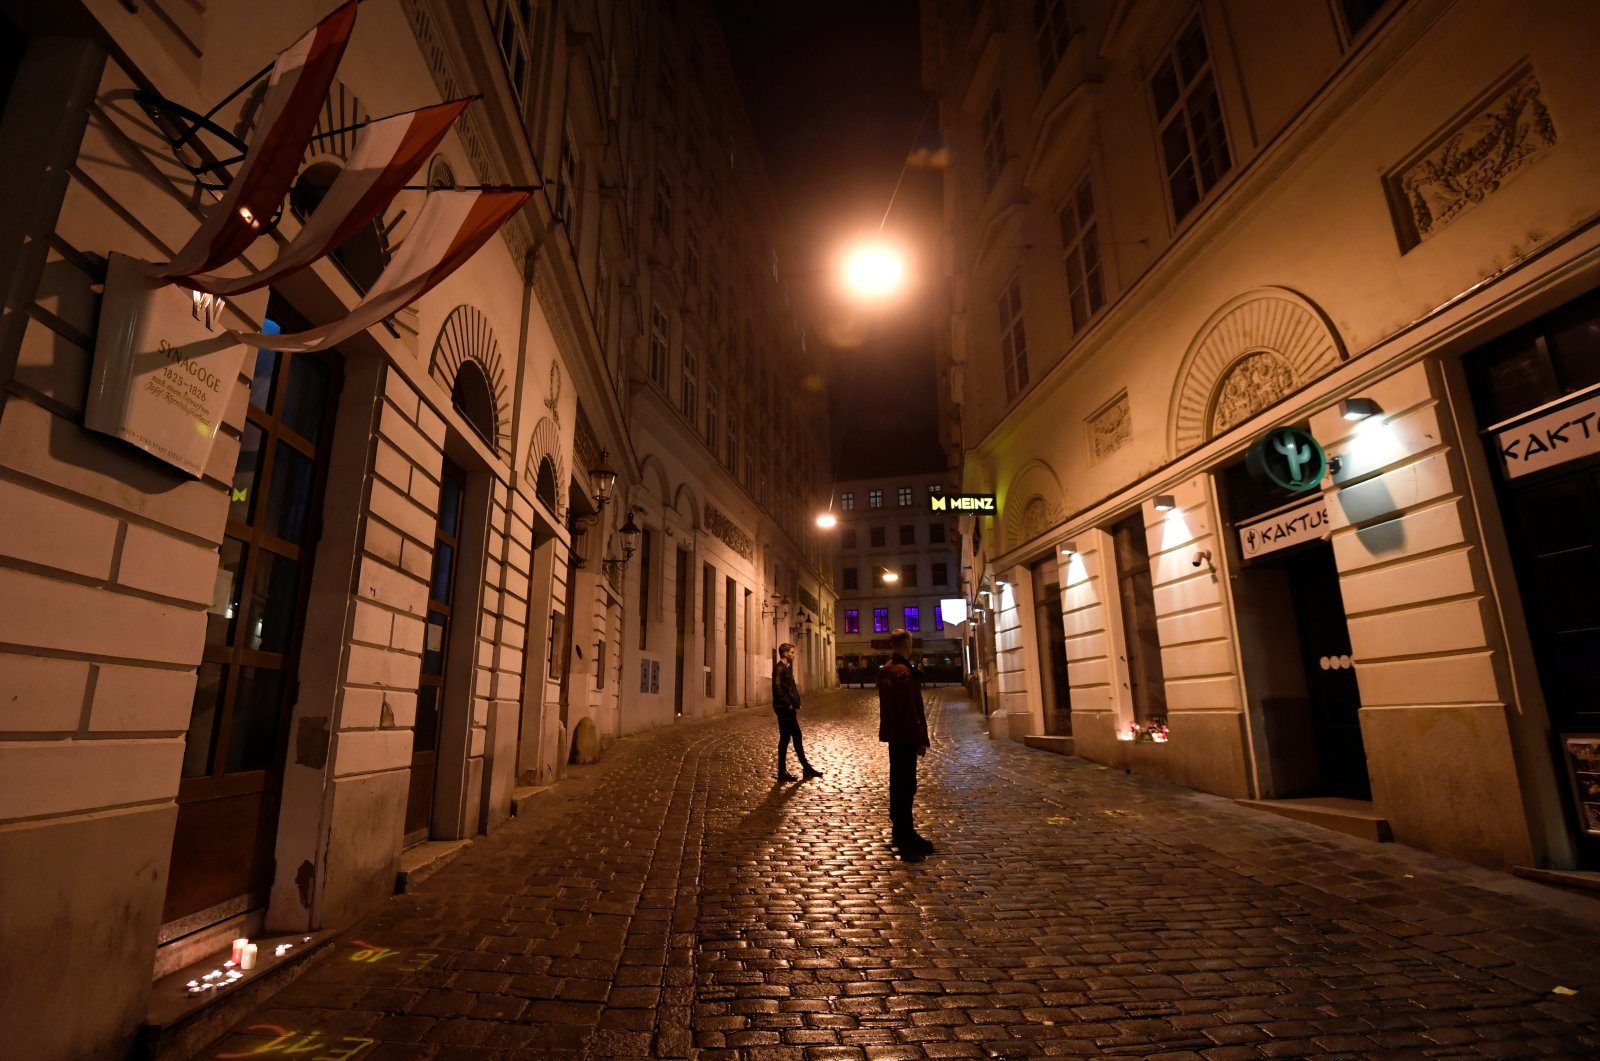 People gather near the site of a gun attack in Vienna, Austria, Nov. 3, 2020. (REUTERS Photo)